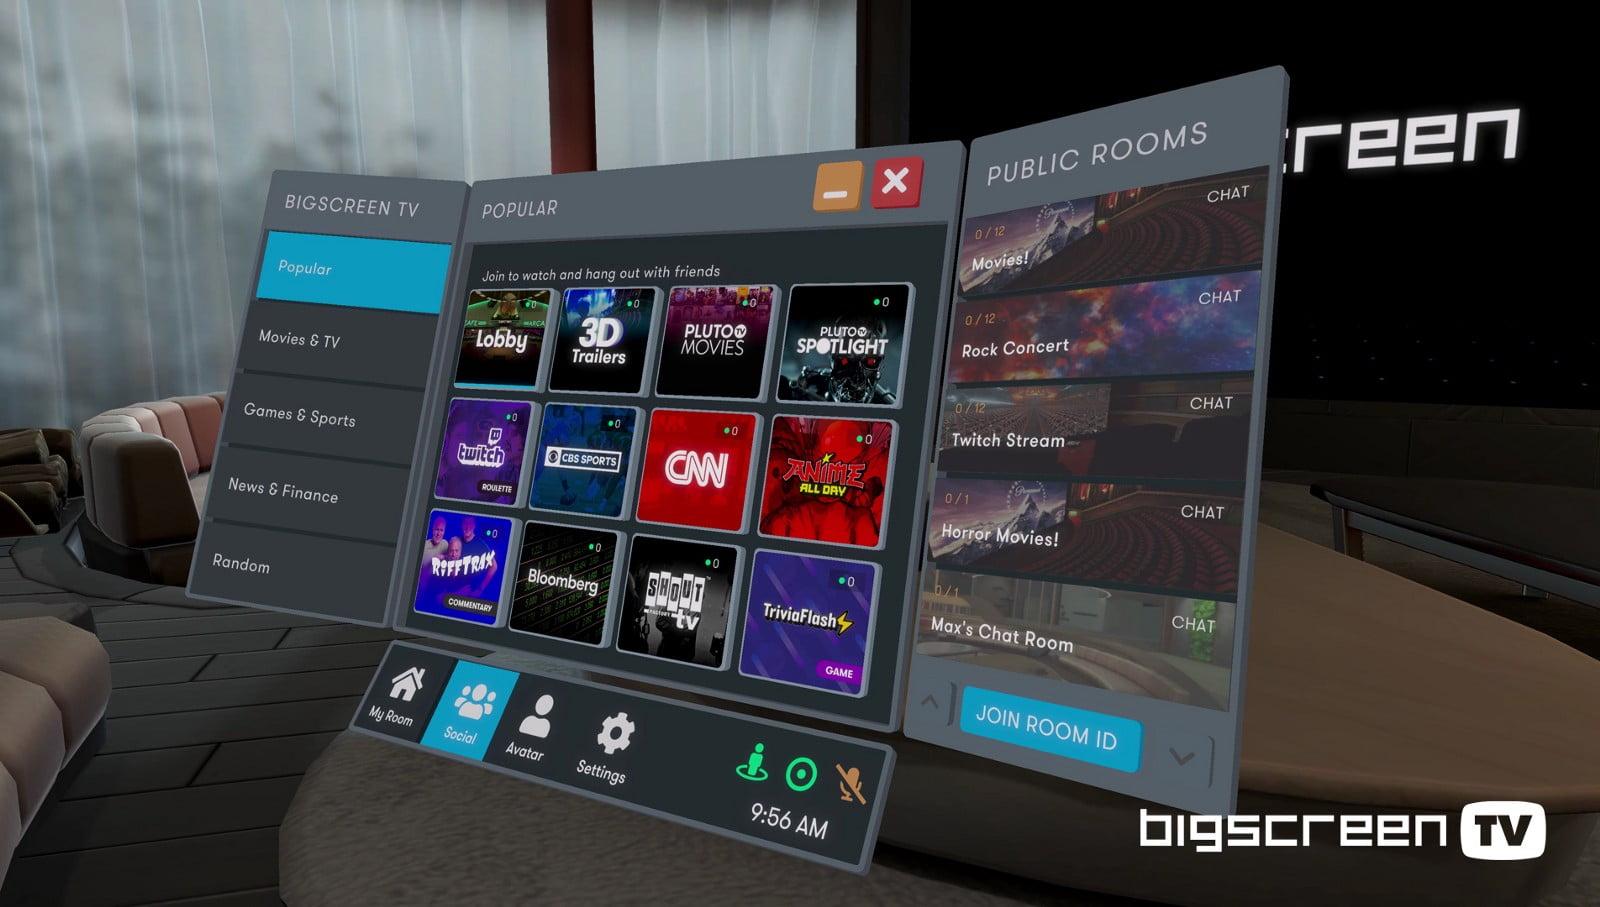 Bigscreen TV: Social-VR-App bietet jetzt 50+ Fernsehkanäle